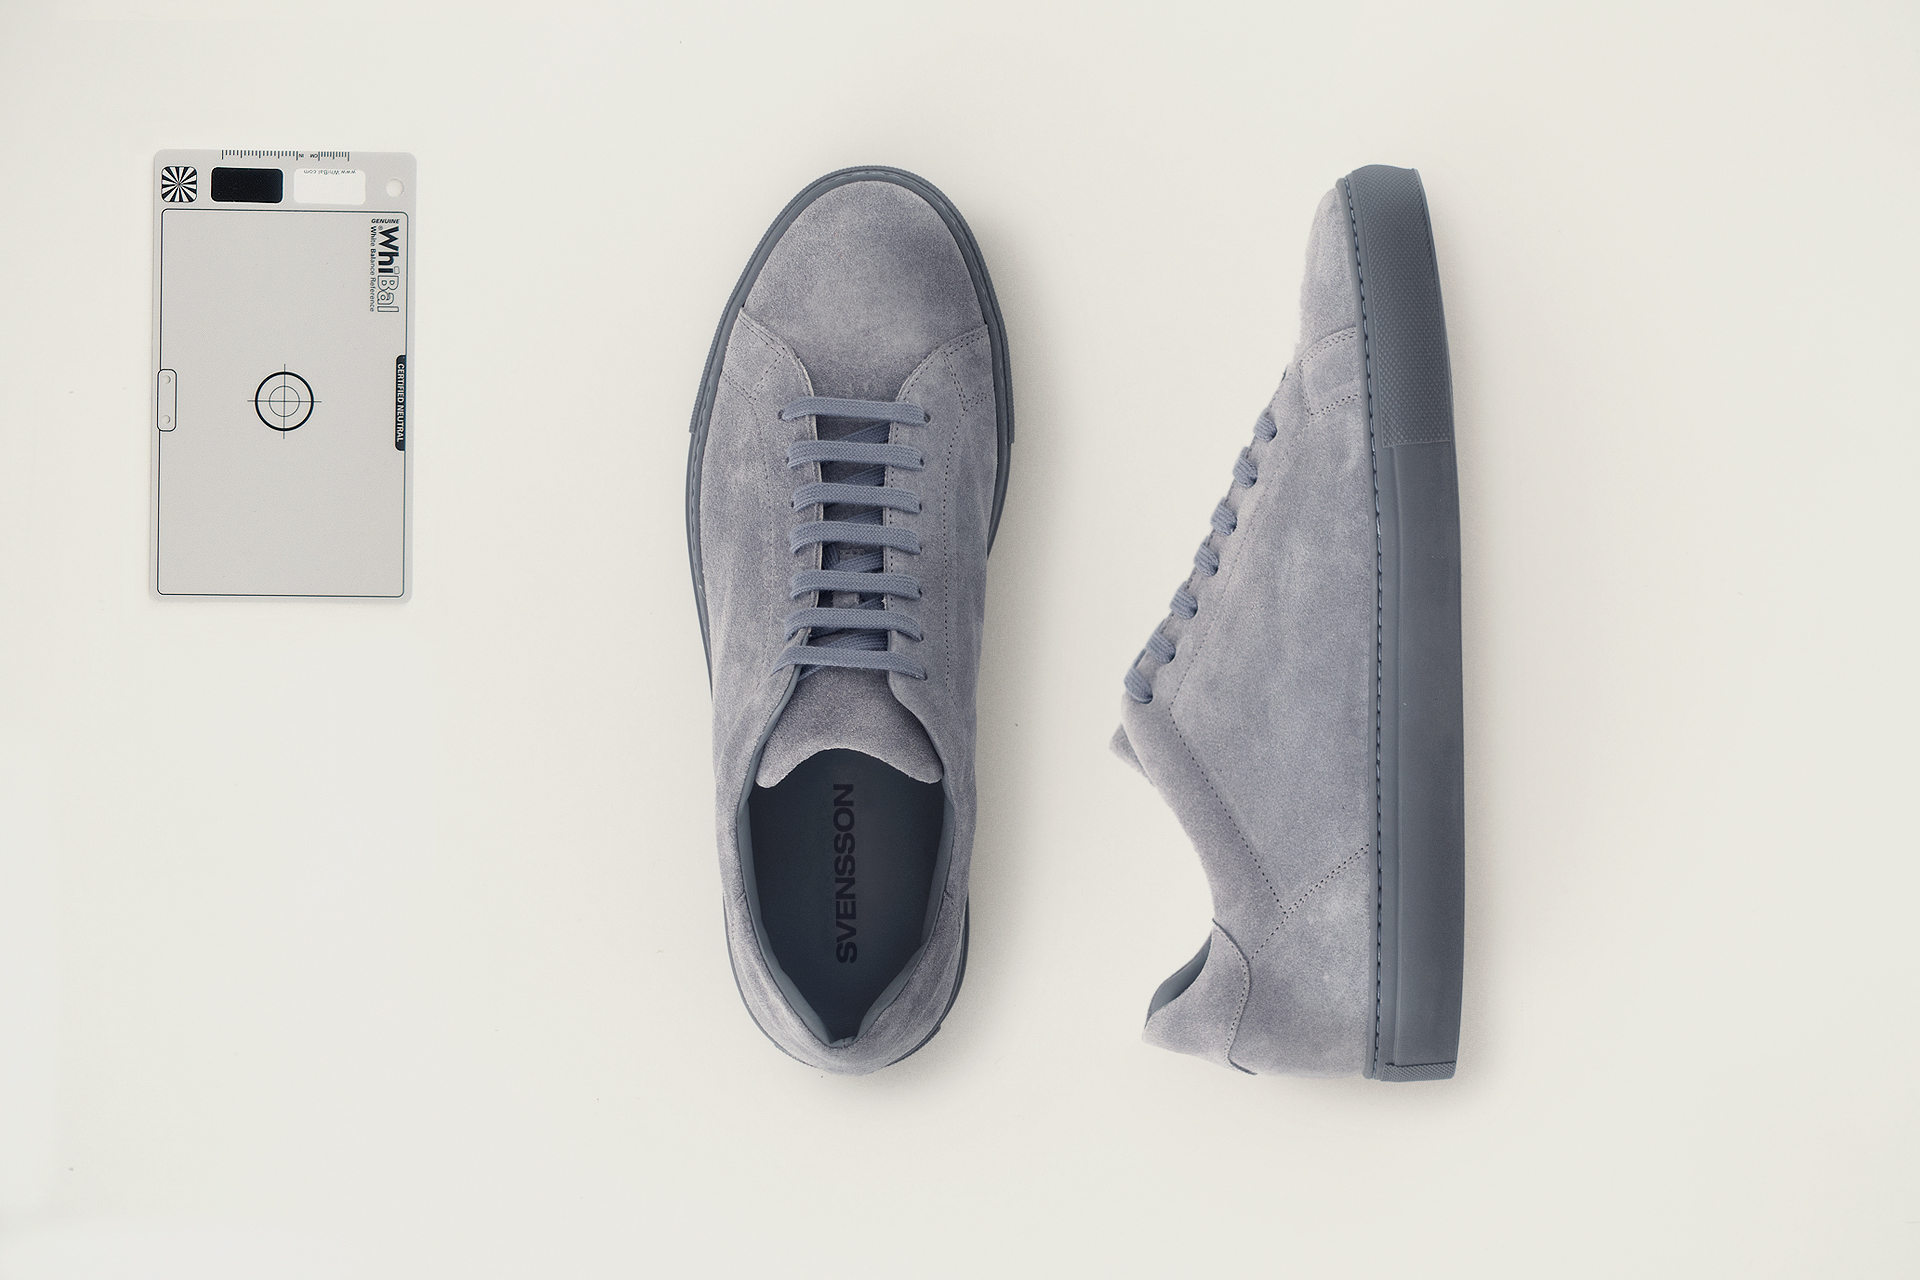 svensson-shoes-classic-low-suede-01